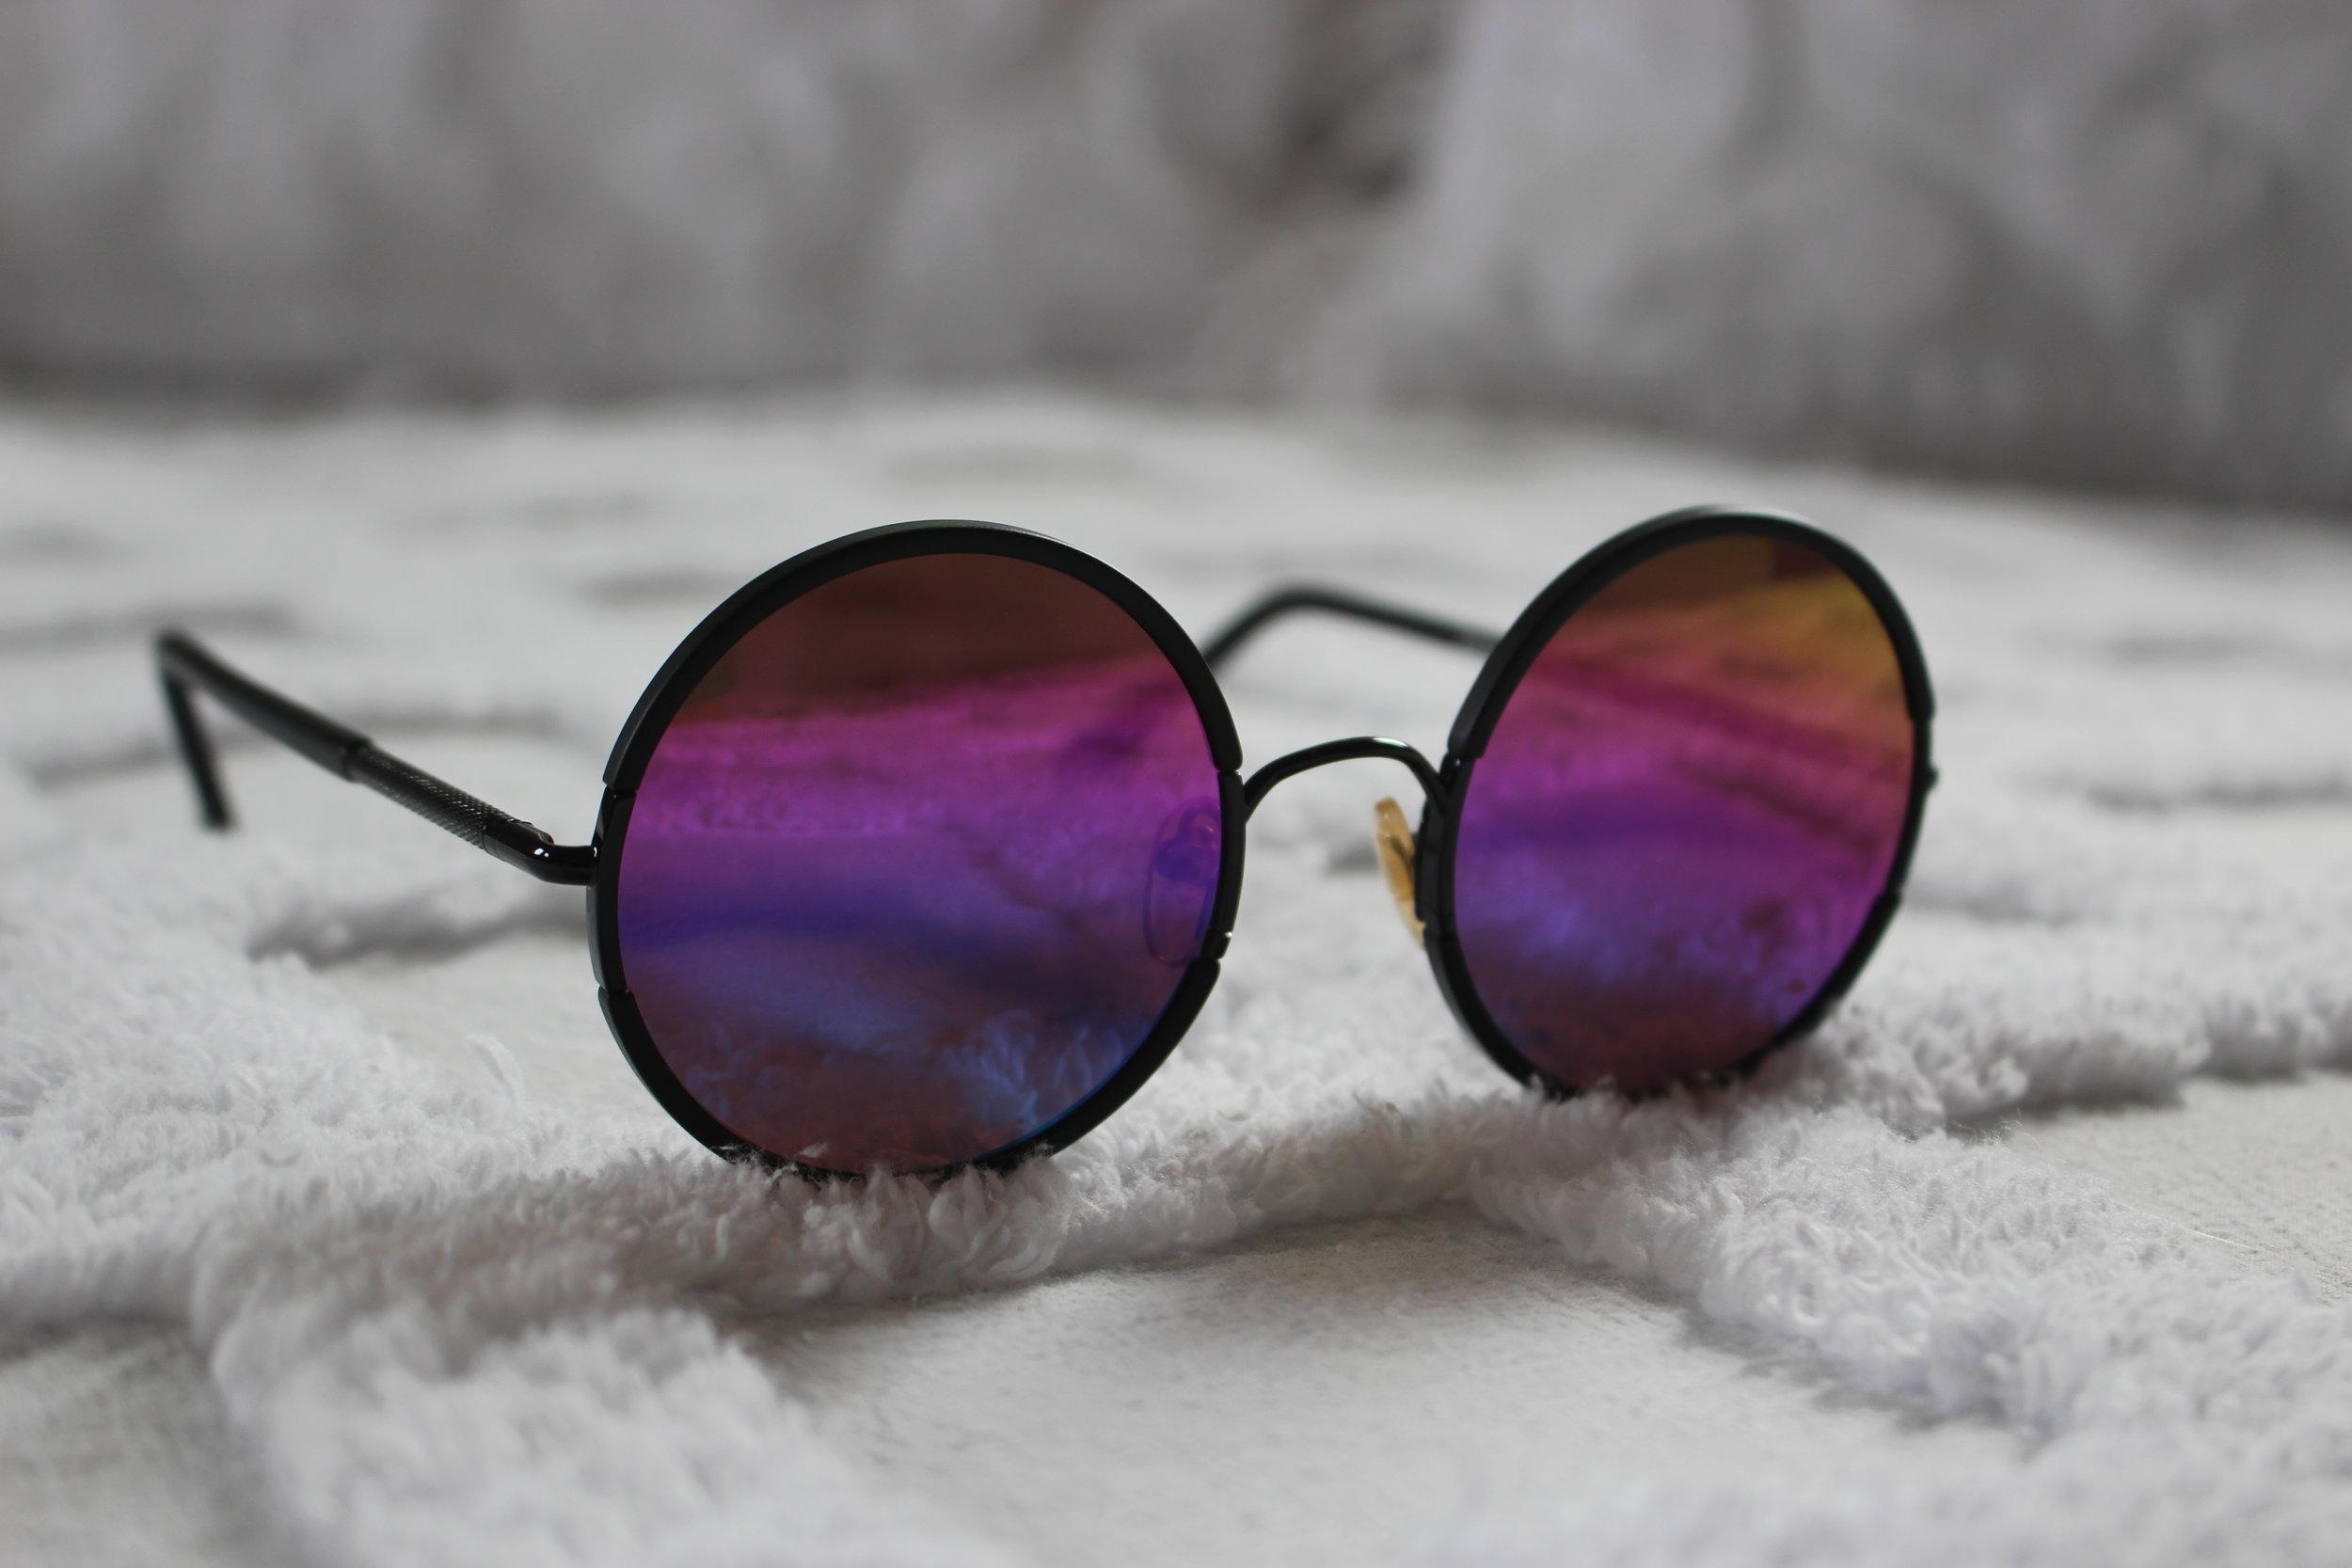 c9844-sunday-somewhere_rainbow_yetti-frames_2.jpg